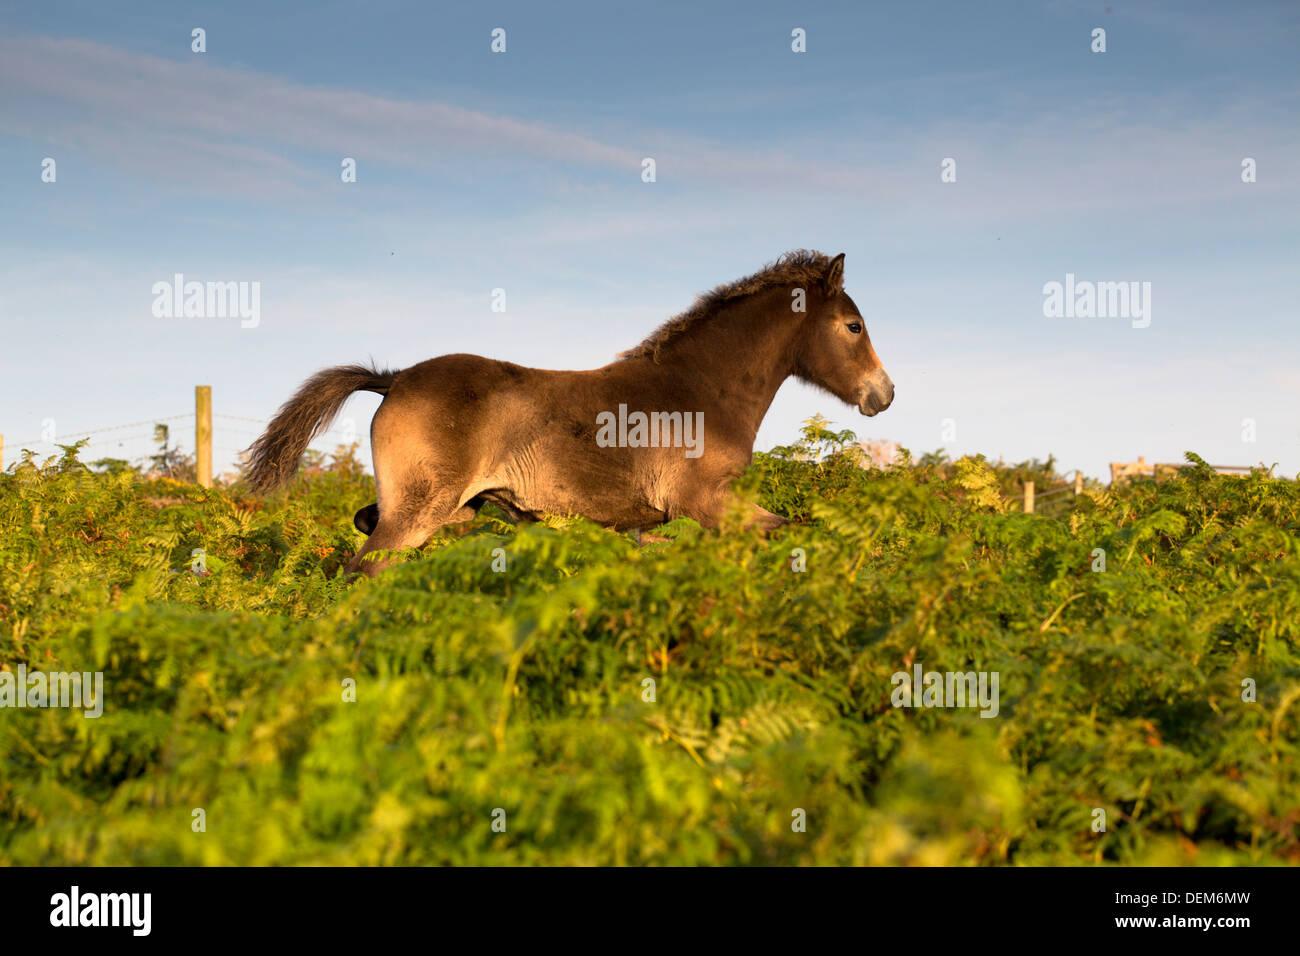 Pony; Al trote; Rosewall; Cornwall; UK Imagen De Stock